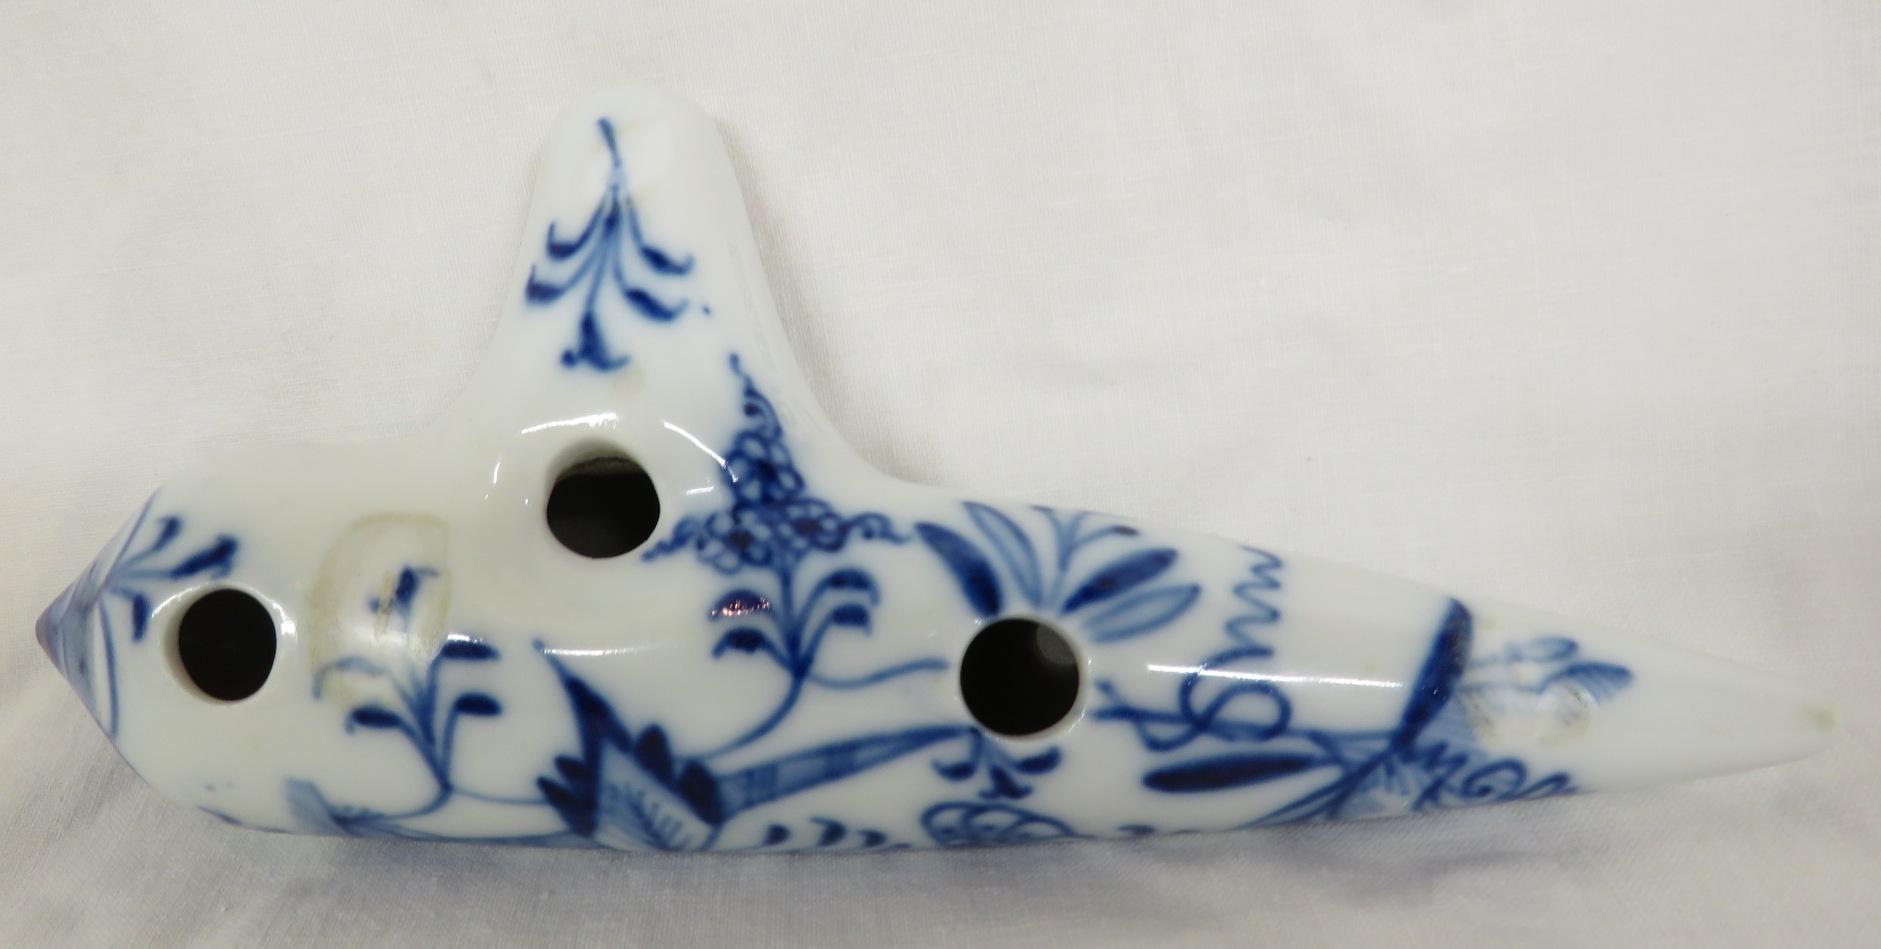 Lot 70 - Porcelain ocarina with underglaze blue foliate decoration, stamped MEISSEN 5D, length 18cm